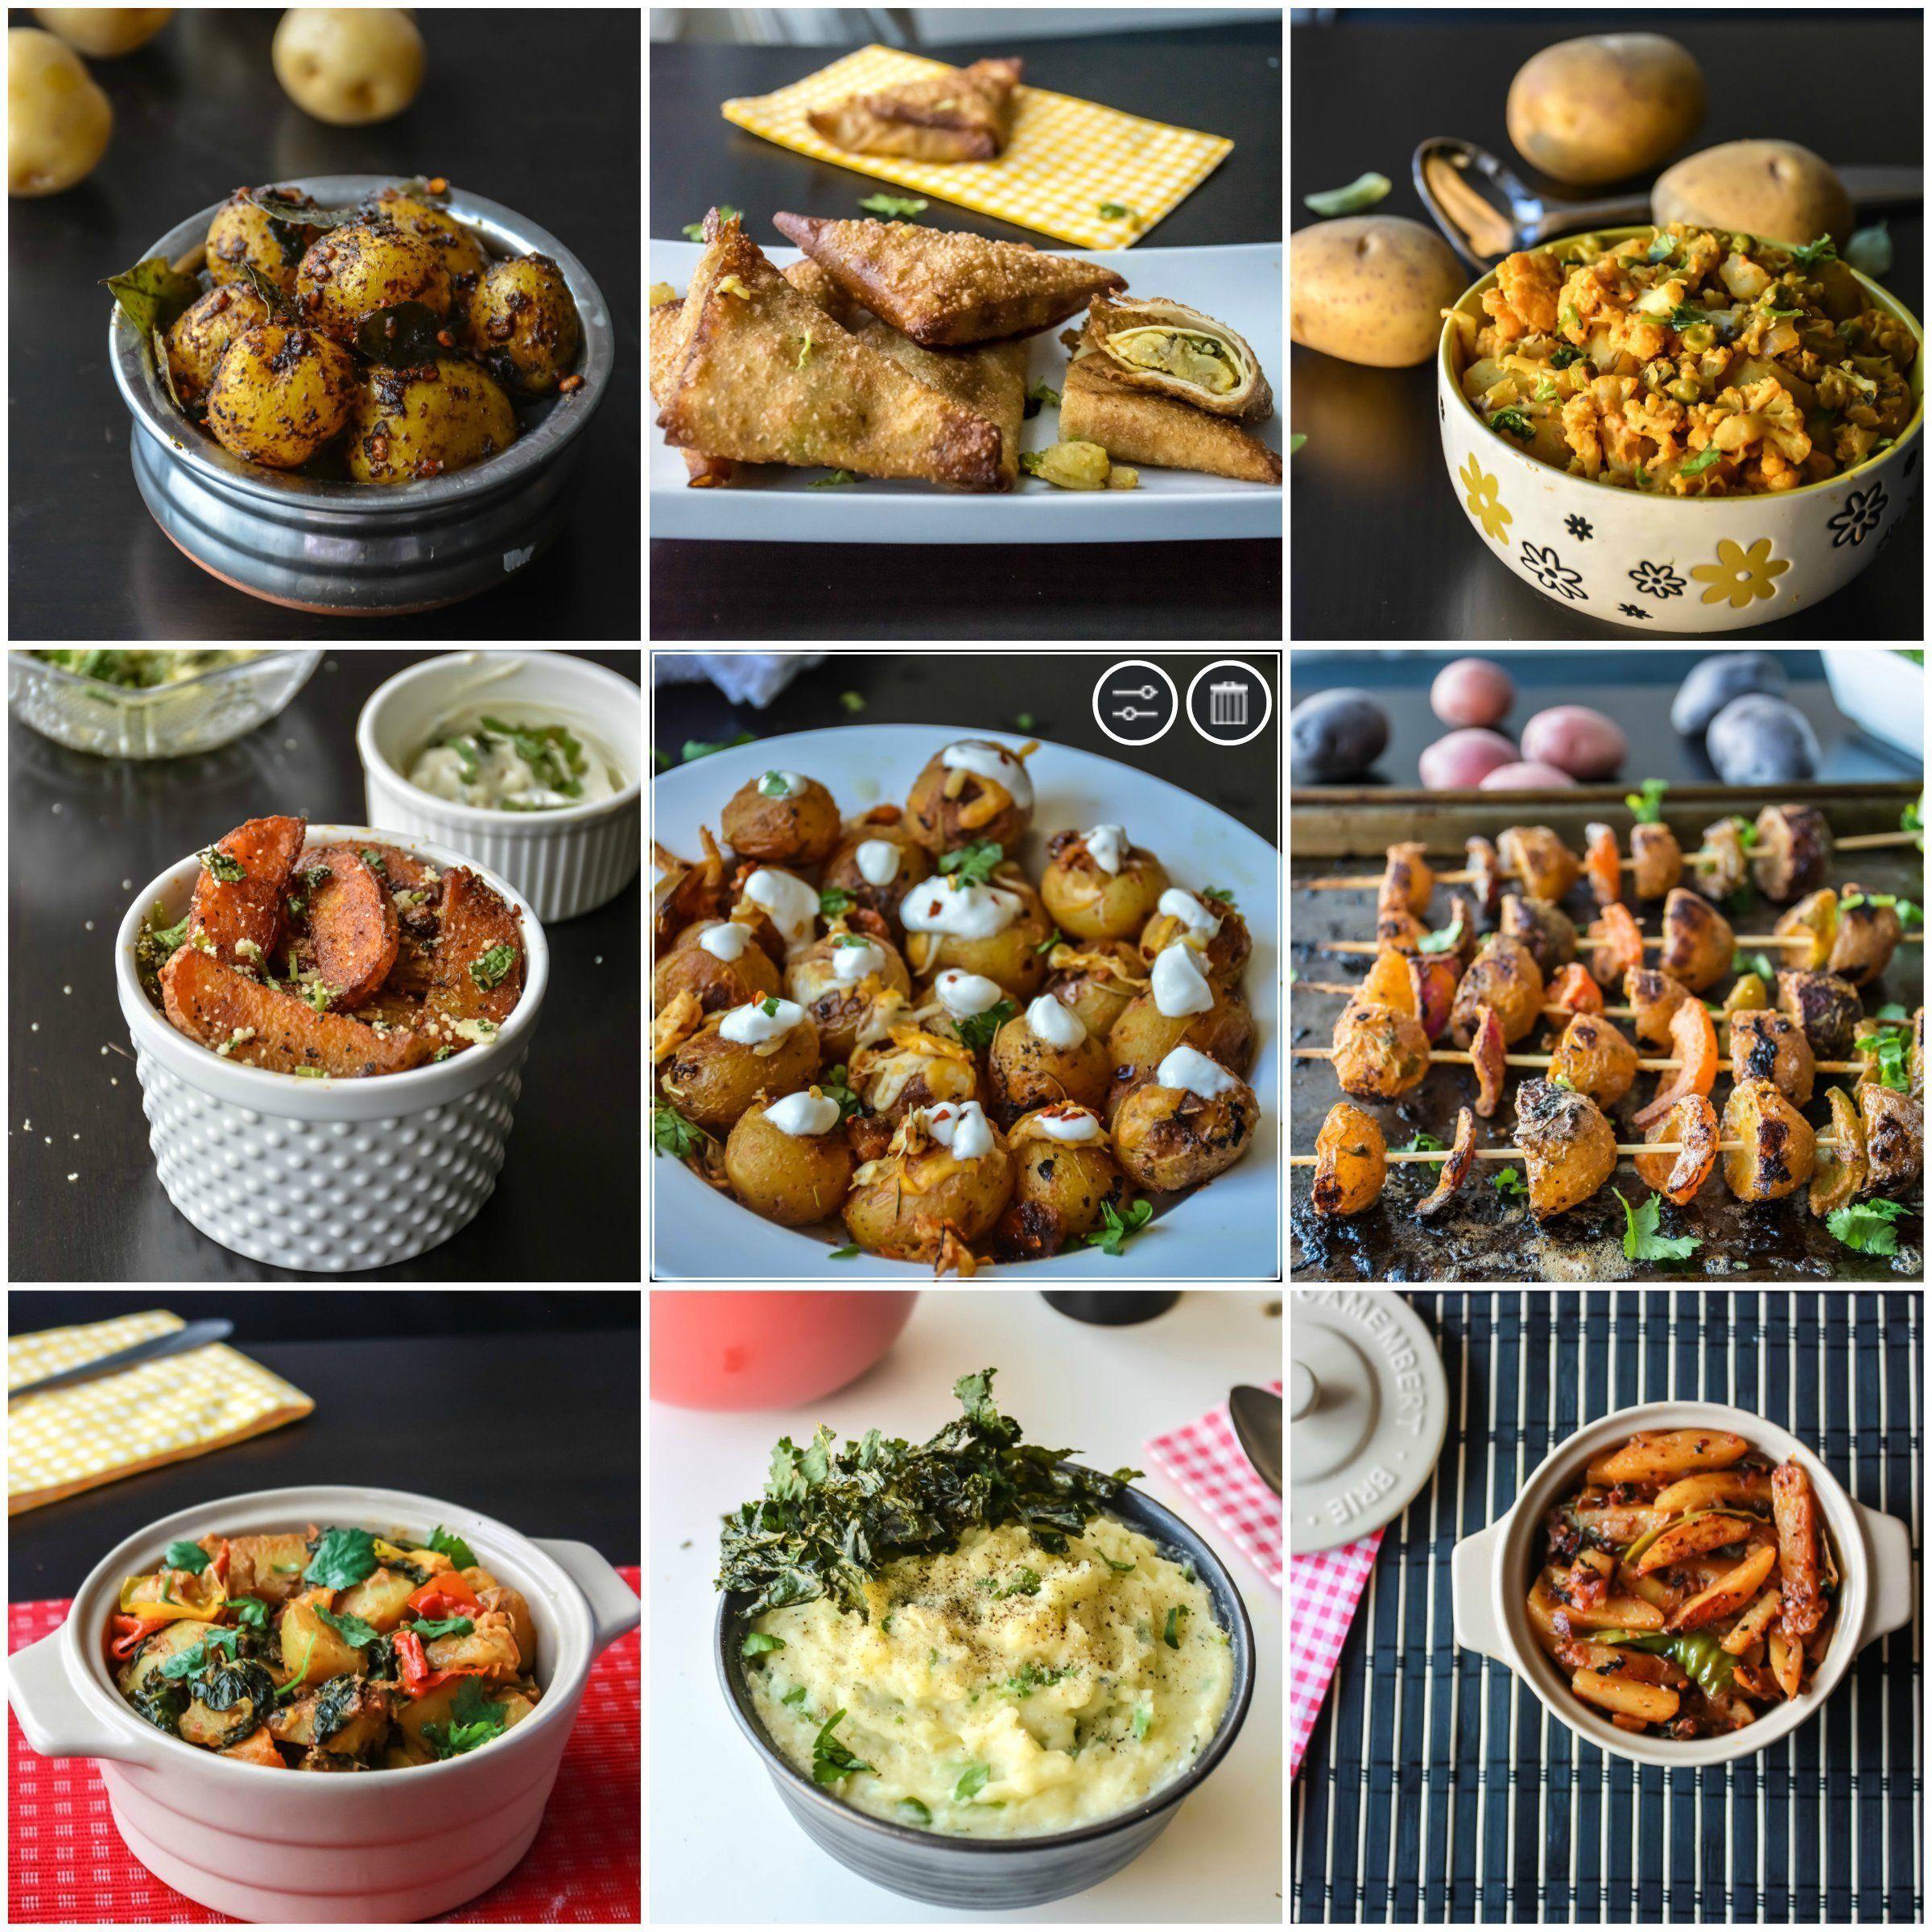 Mouthwatering vegetarian potato recipes you need to try vegetarian mouthwatering vegetarian potato recipes you need to try forumfinder Images